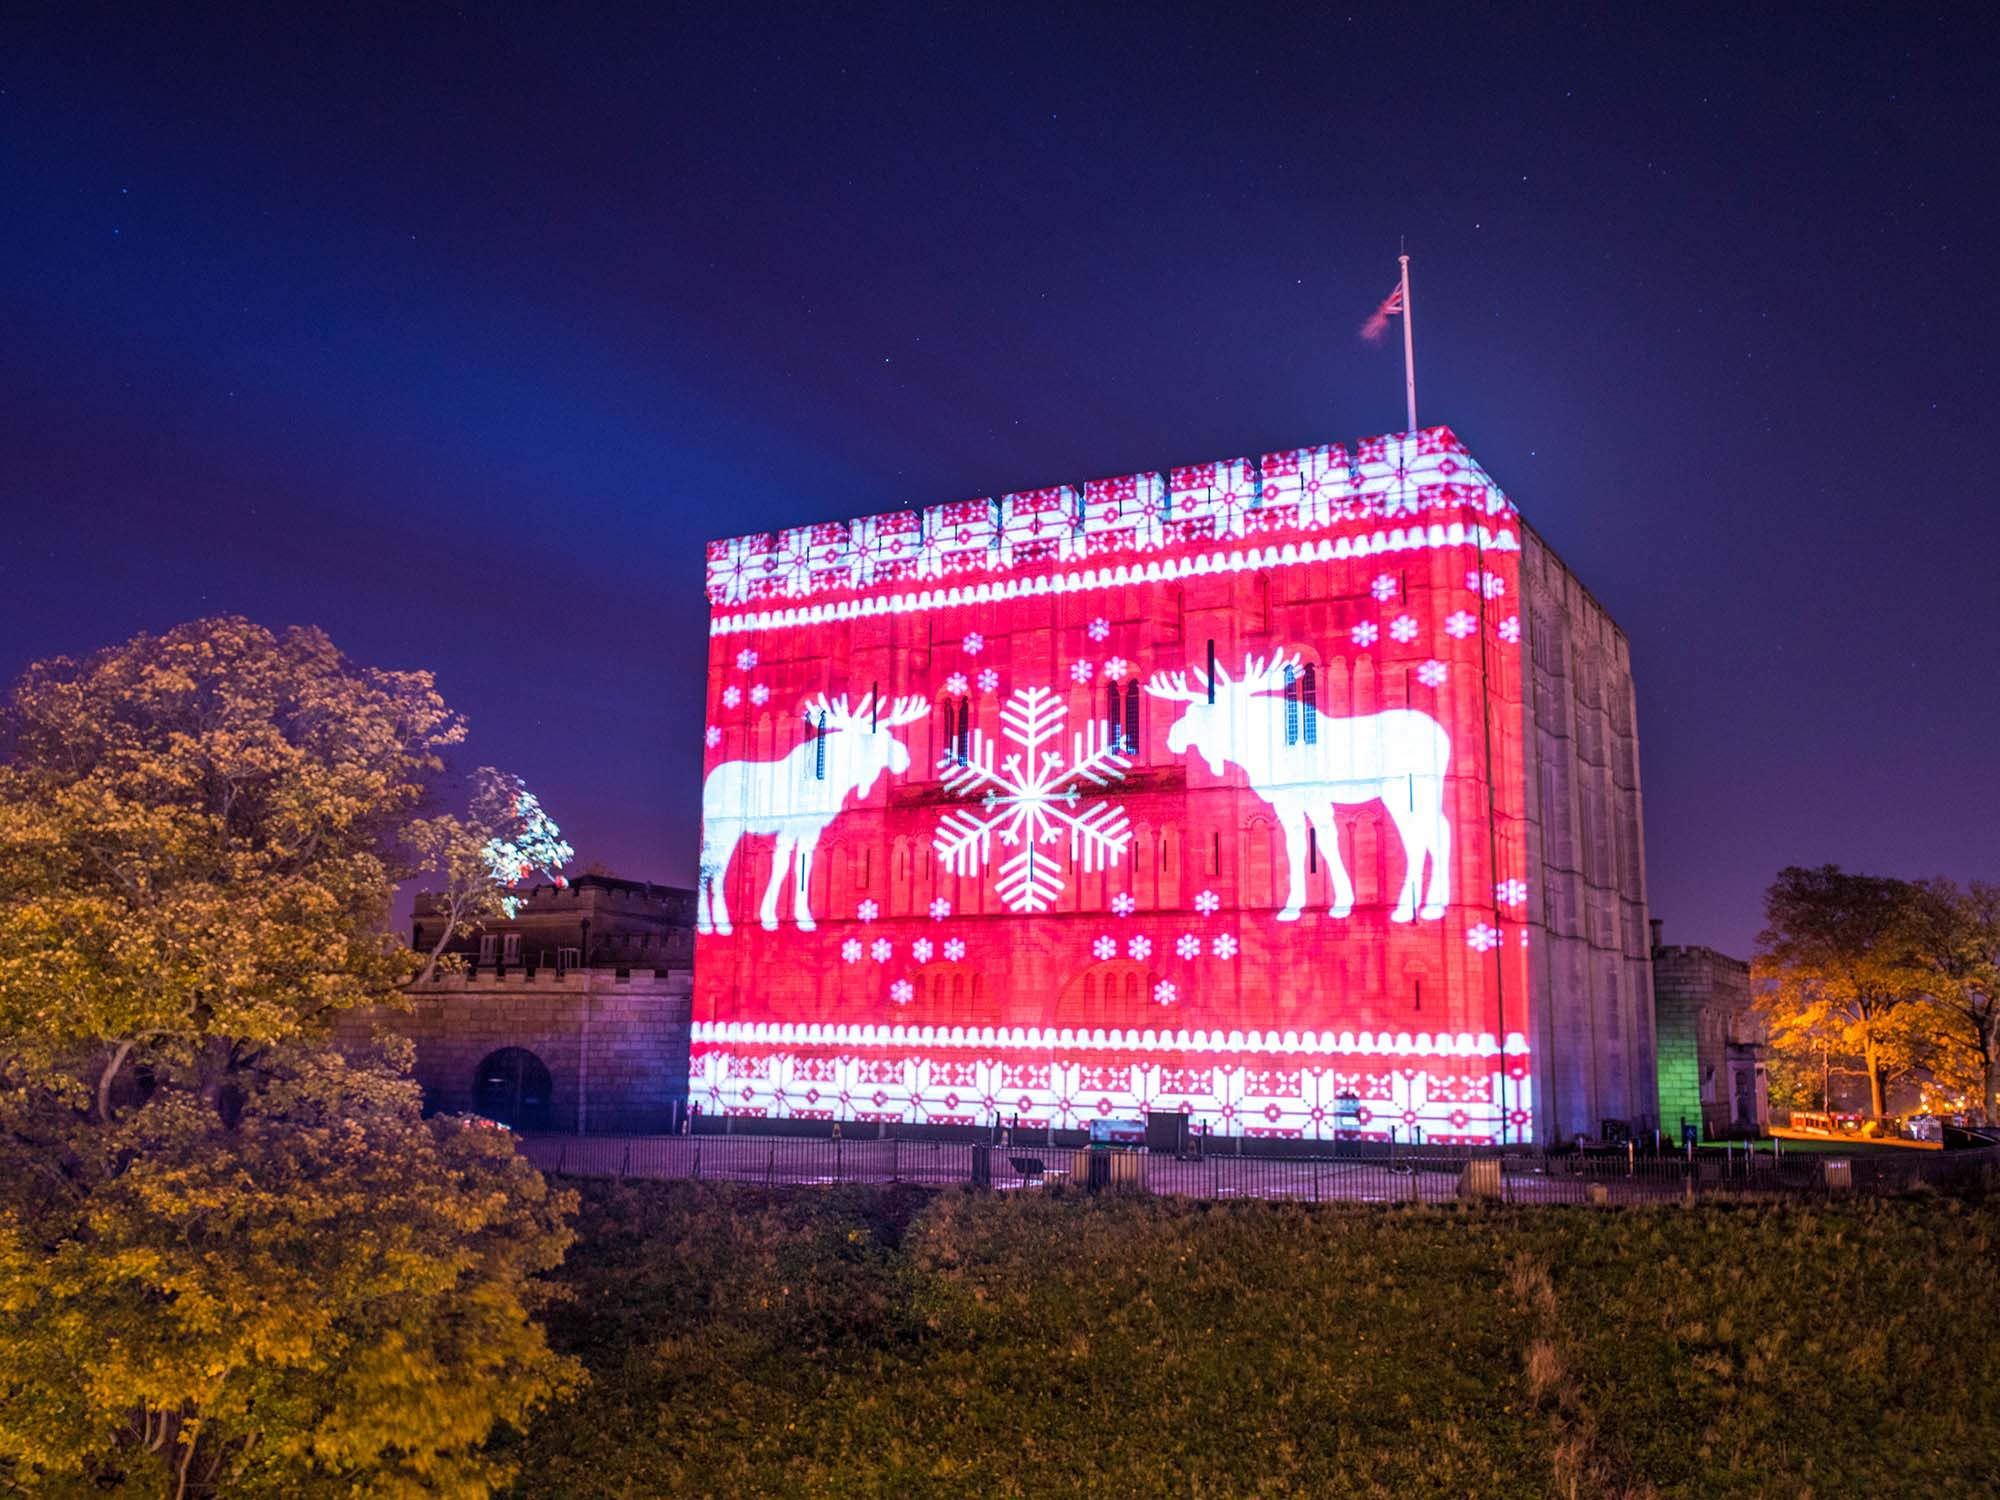 Norwich Castle Christmas projections show live